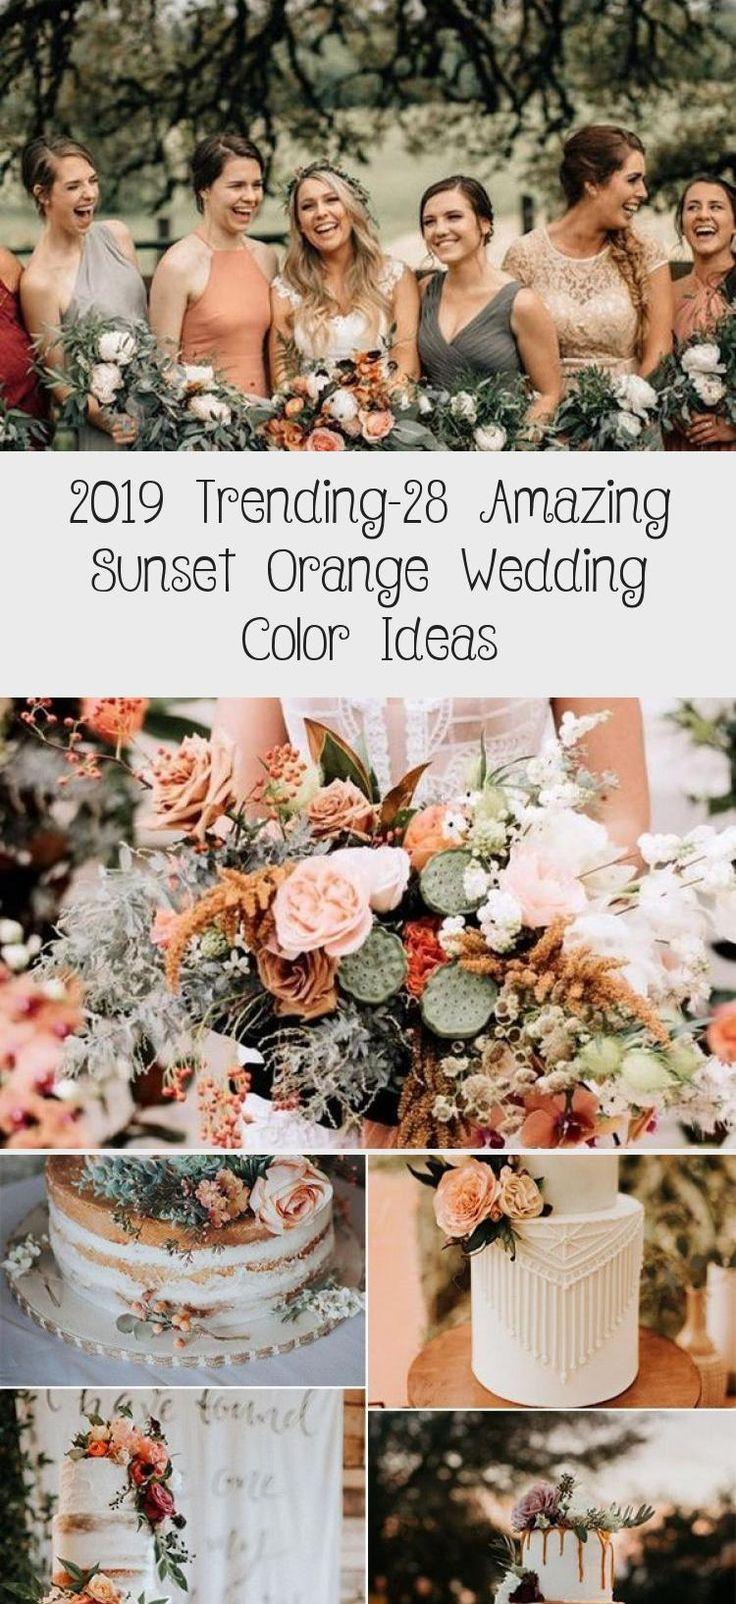 dusty orange mix and match bridesmaid dresses #WhiteBridesmaidDresses #PeachBridesmaidDresses #TaupeBridesmaidDresses #BridesmaidDressesStyles #BurgundyBridesmaidDresses